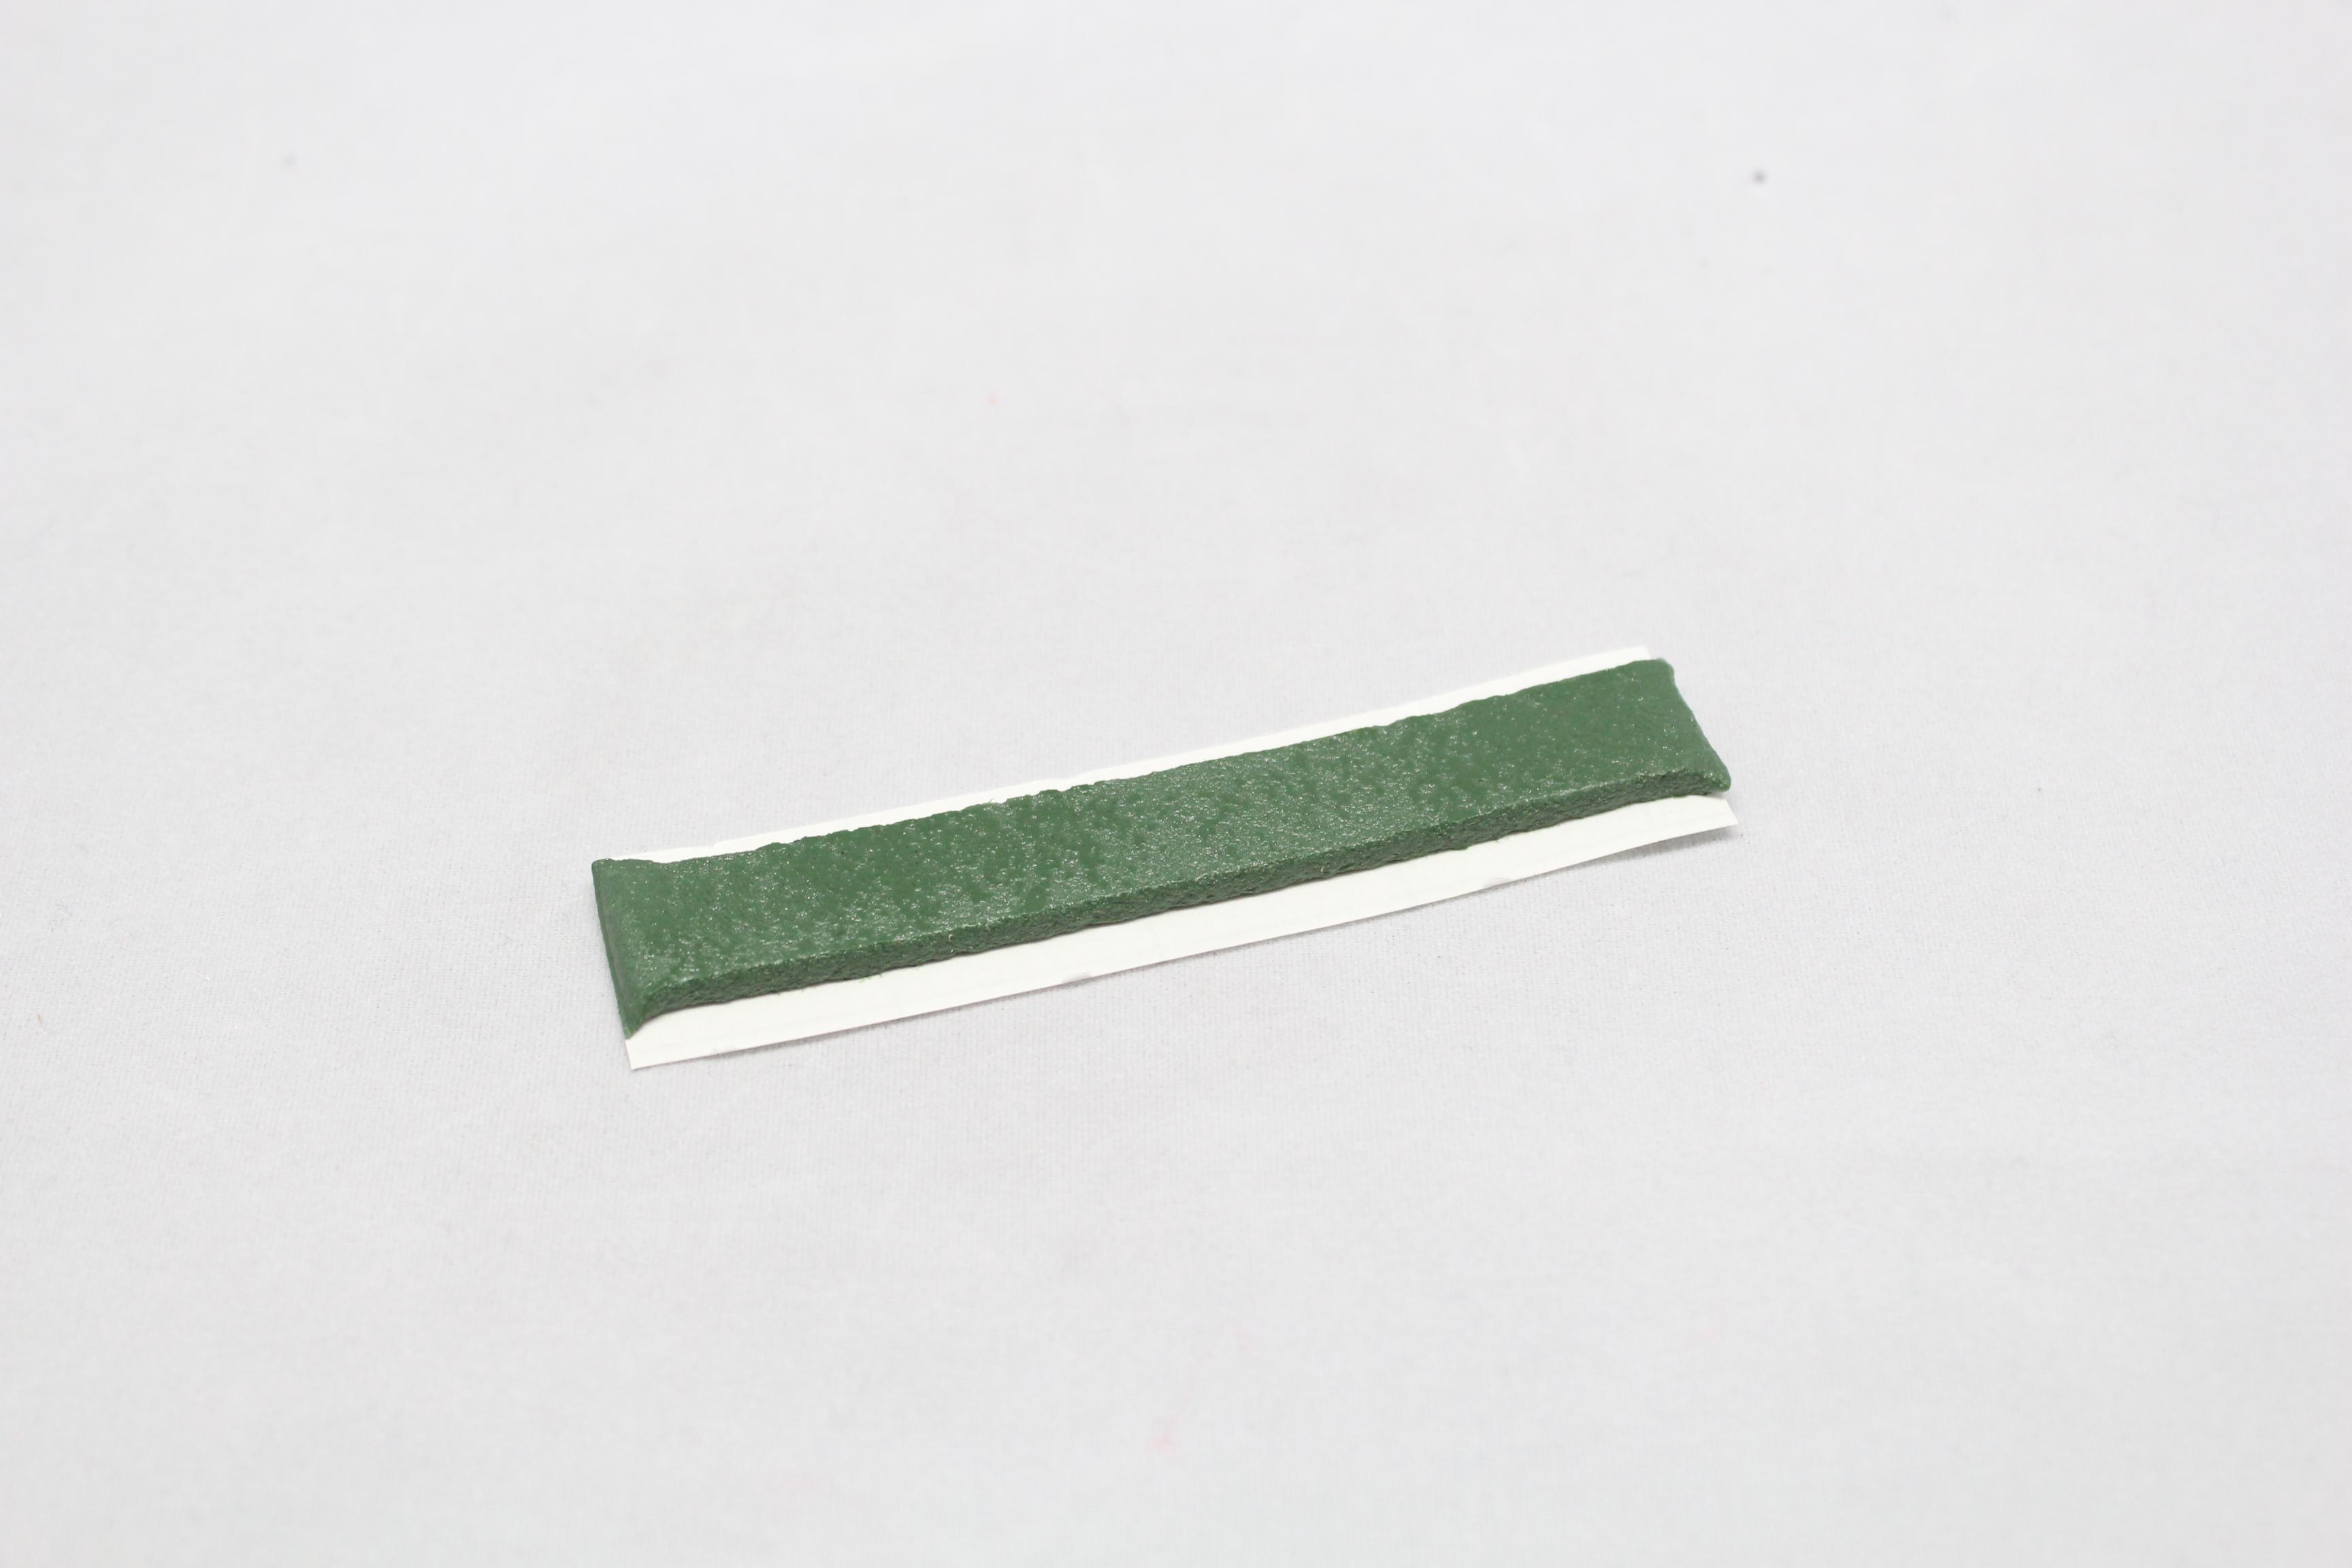 Aranžovací fixační páska 8x1cm